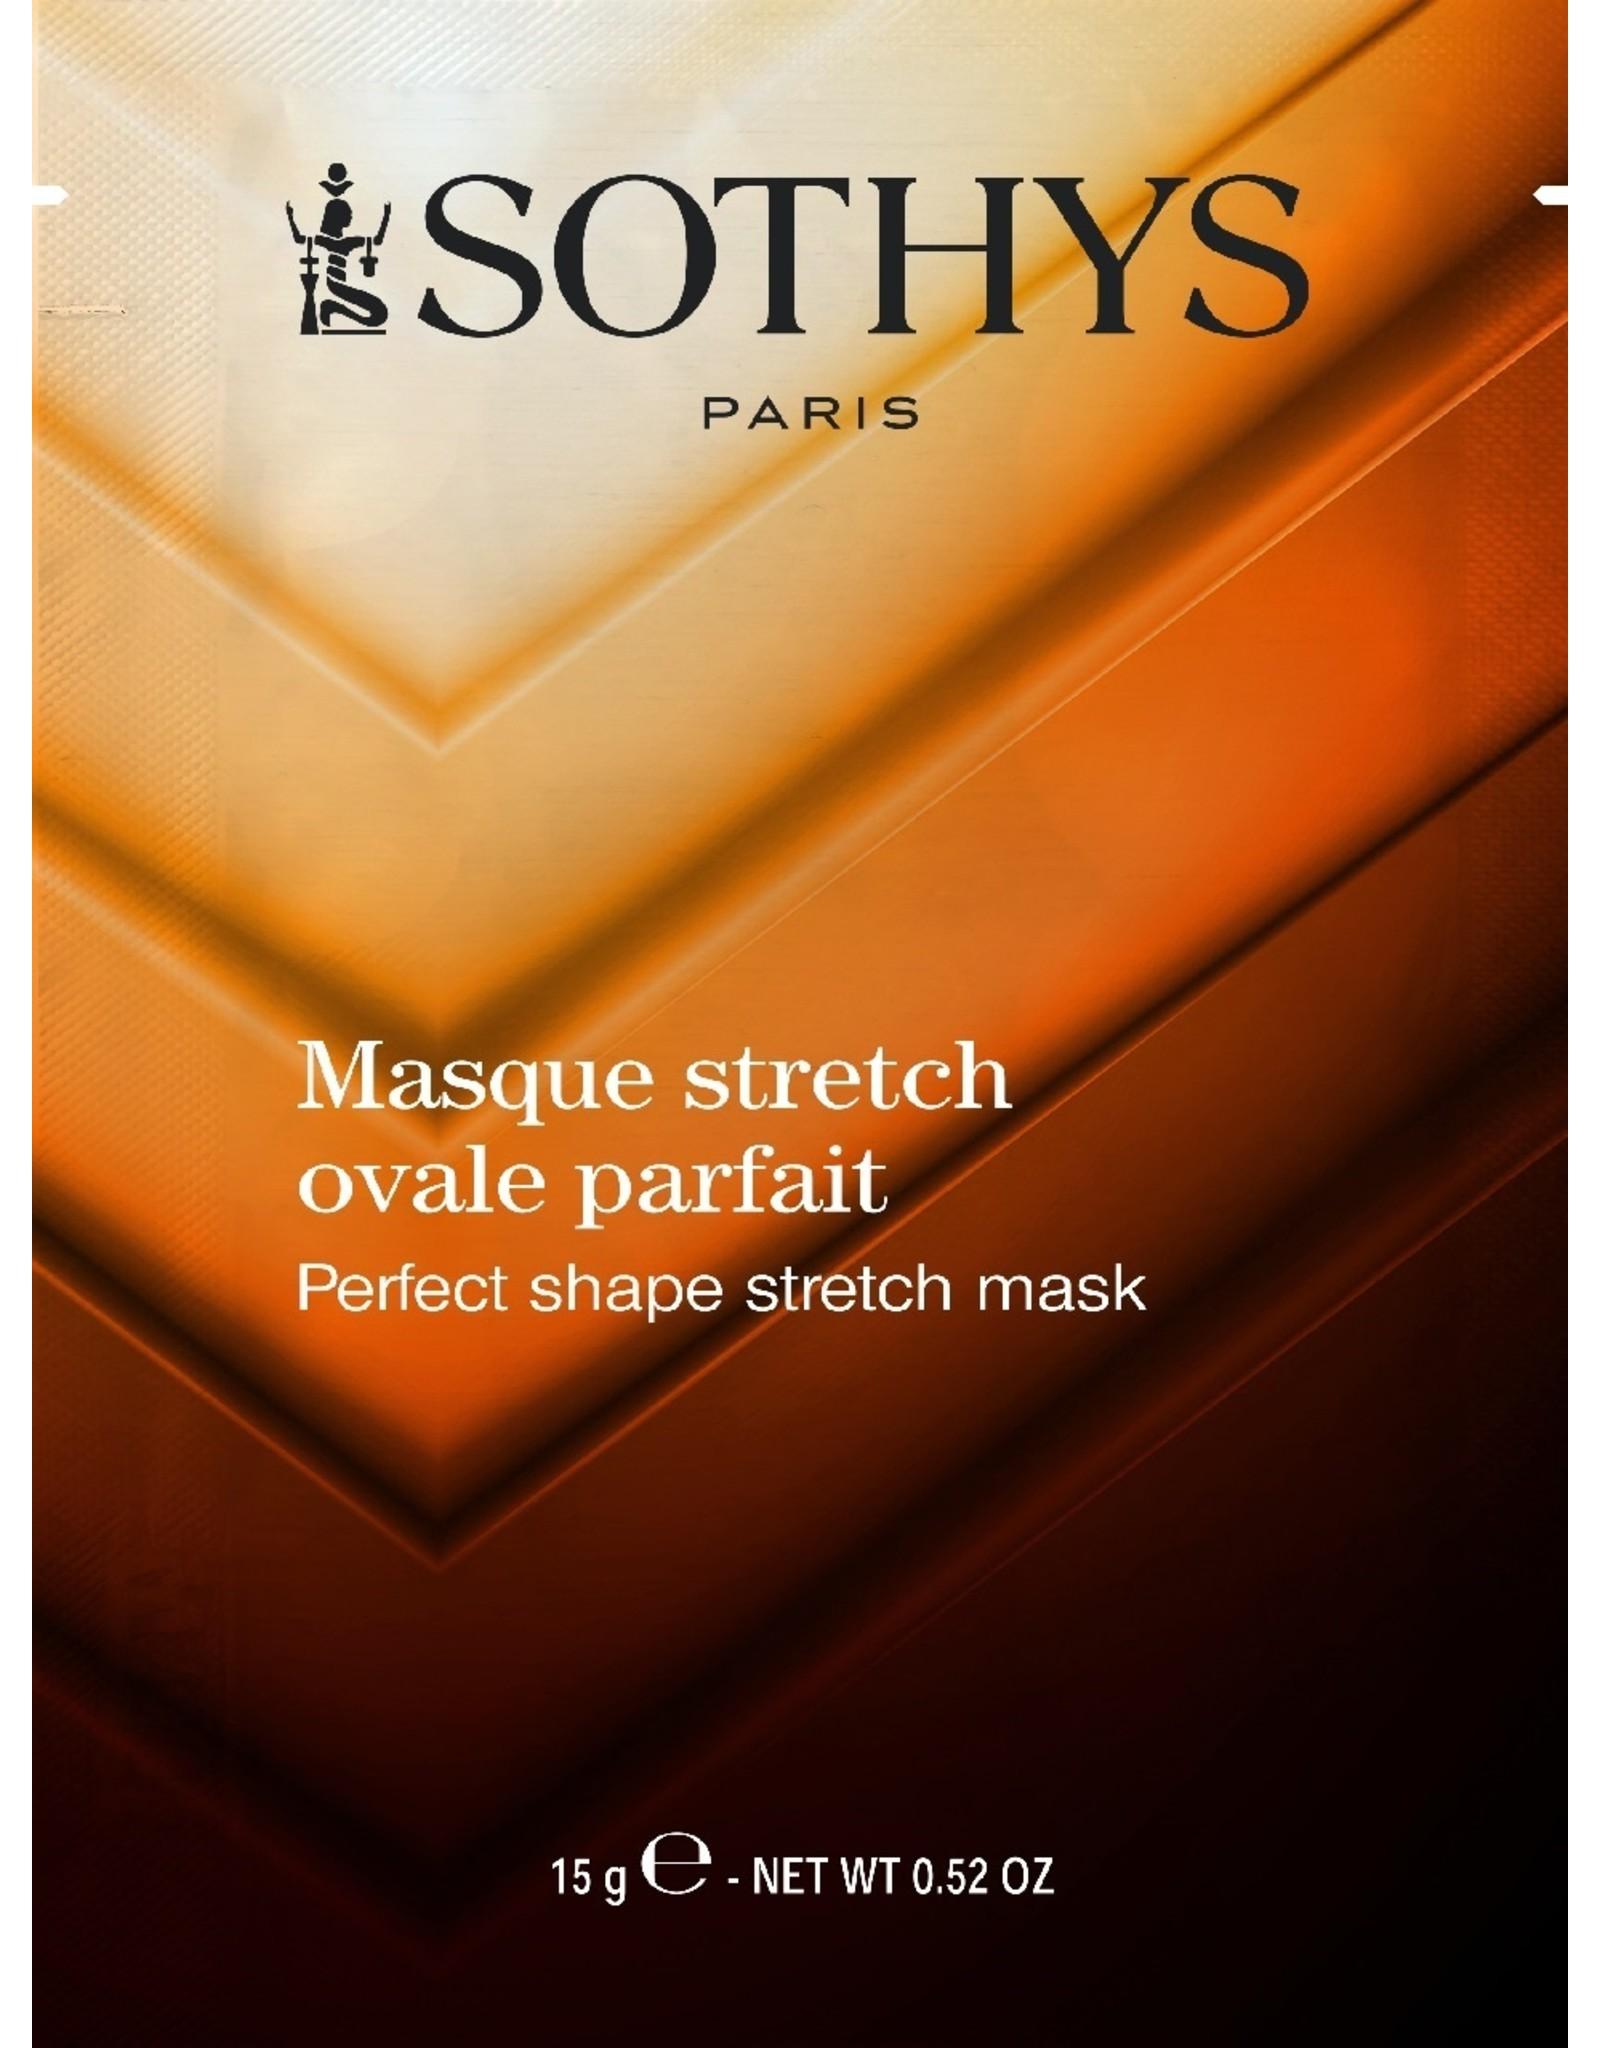 SOTHYS Masque stretch ovale parfait - Sothys